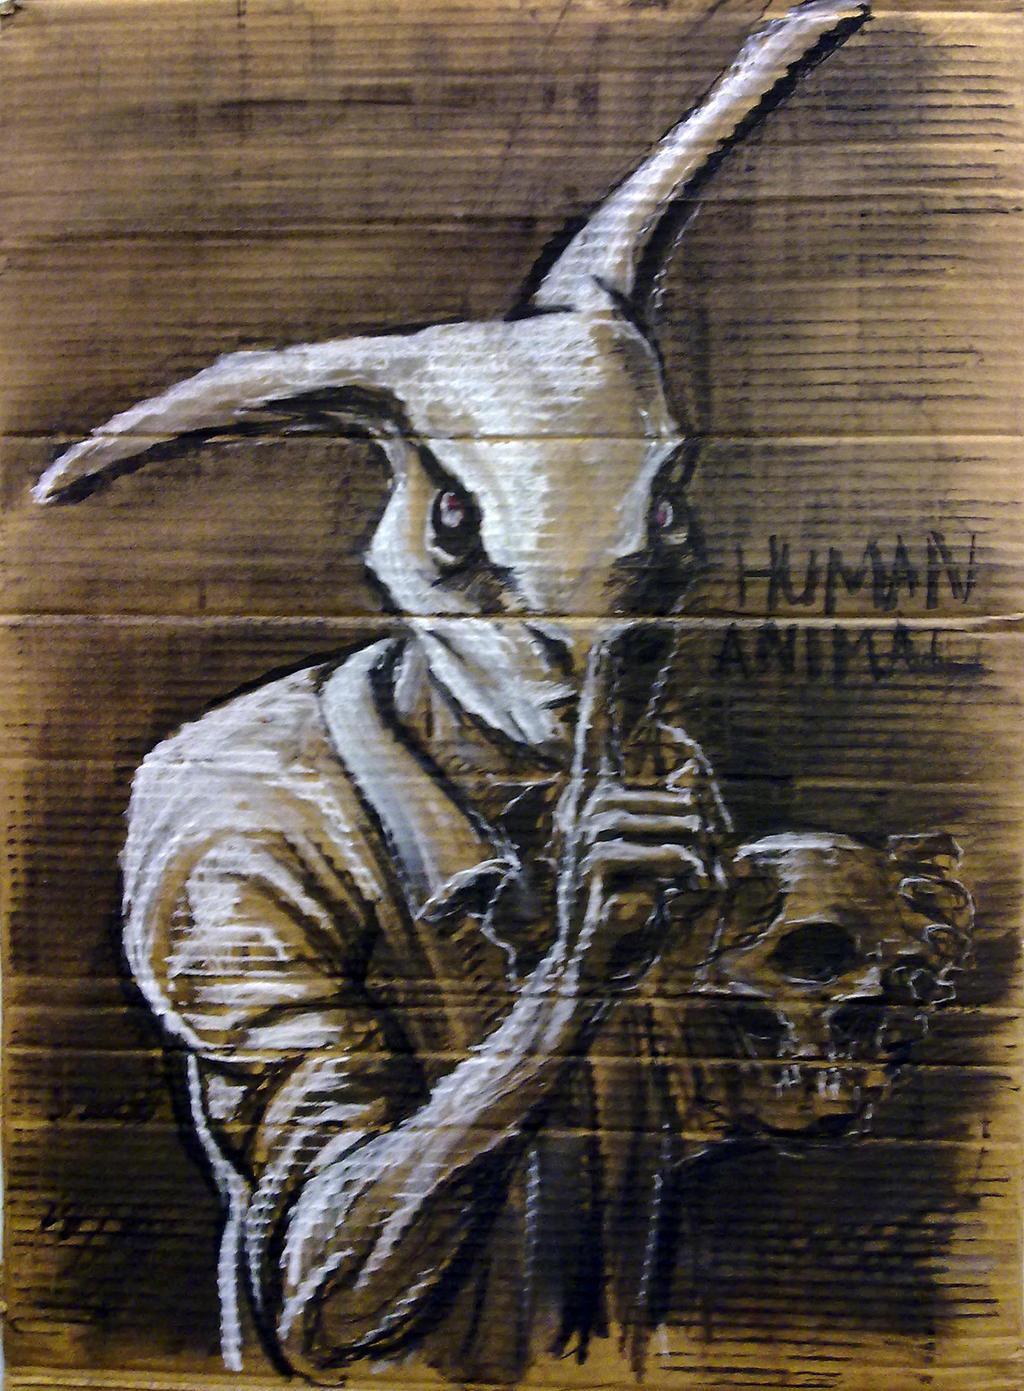 Human Animal by stolendata